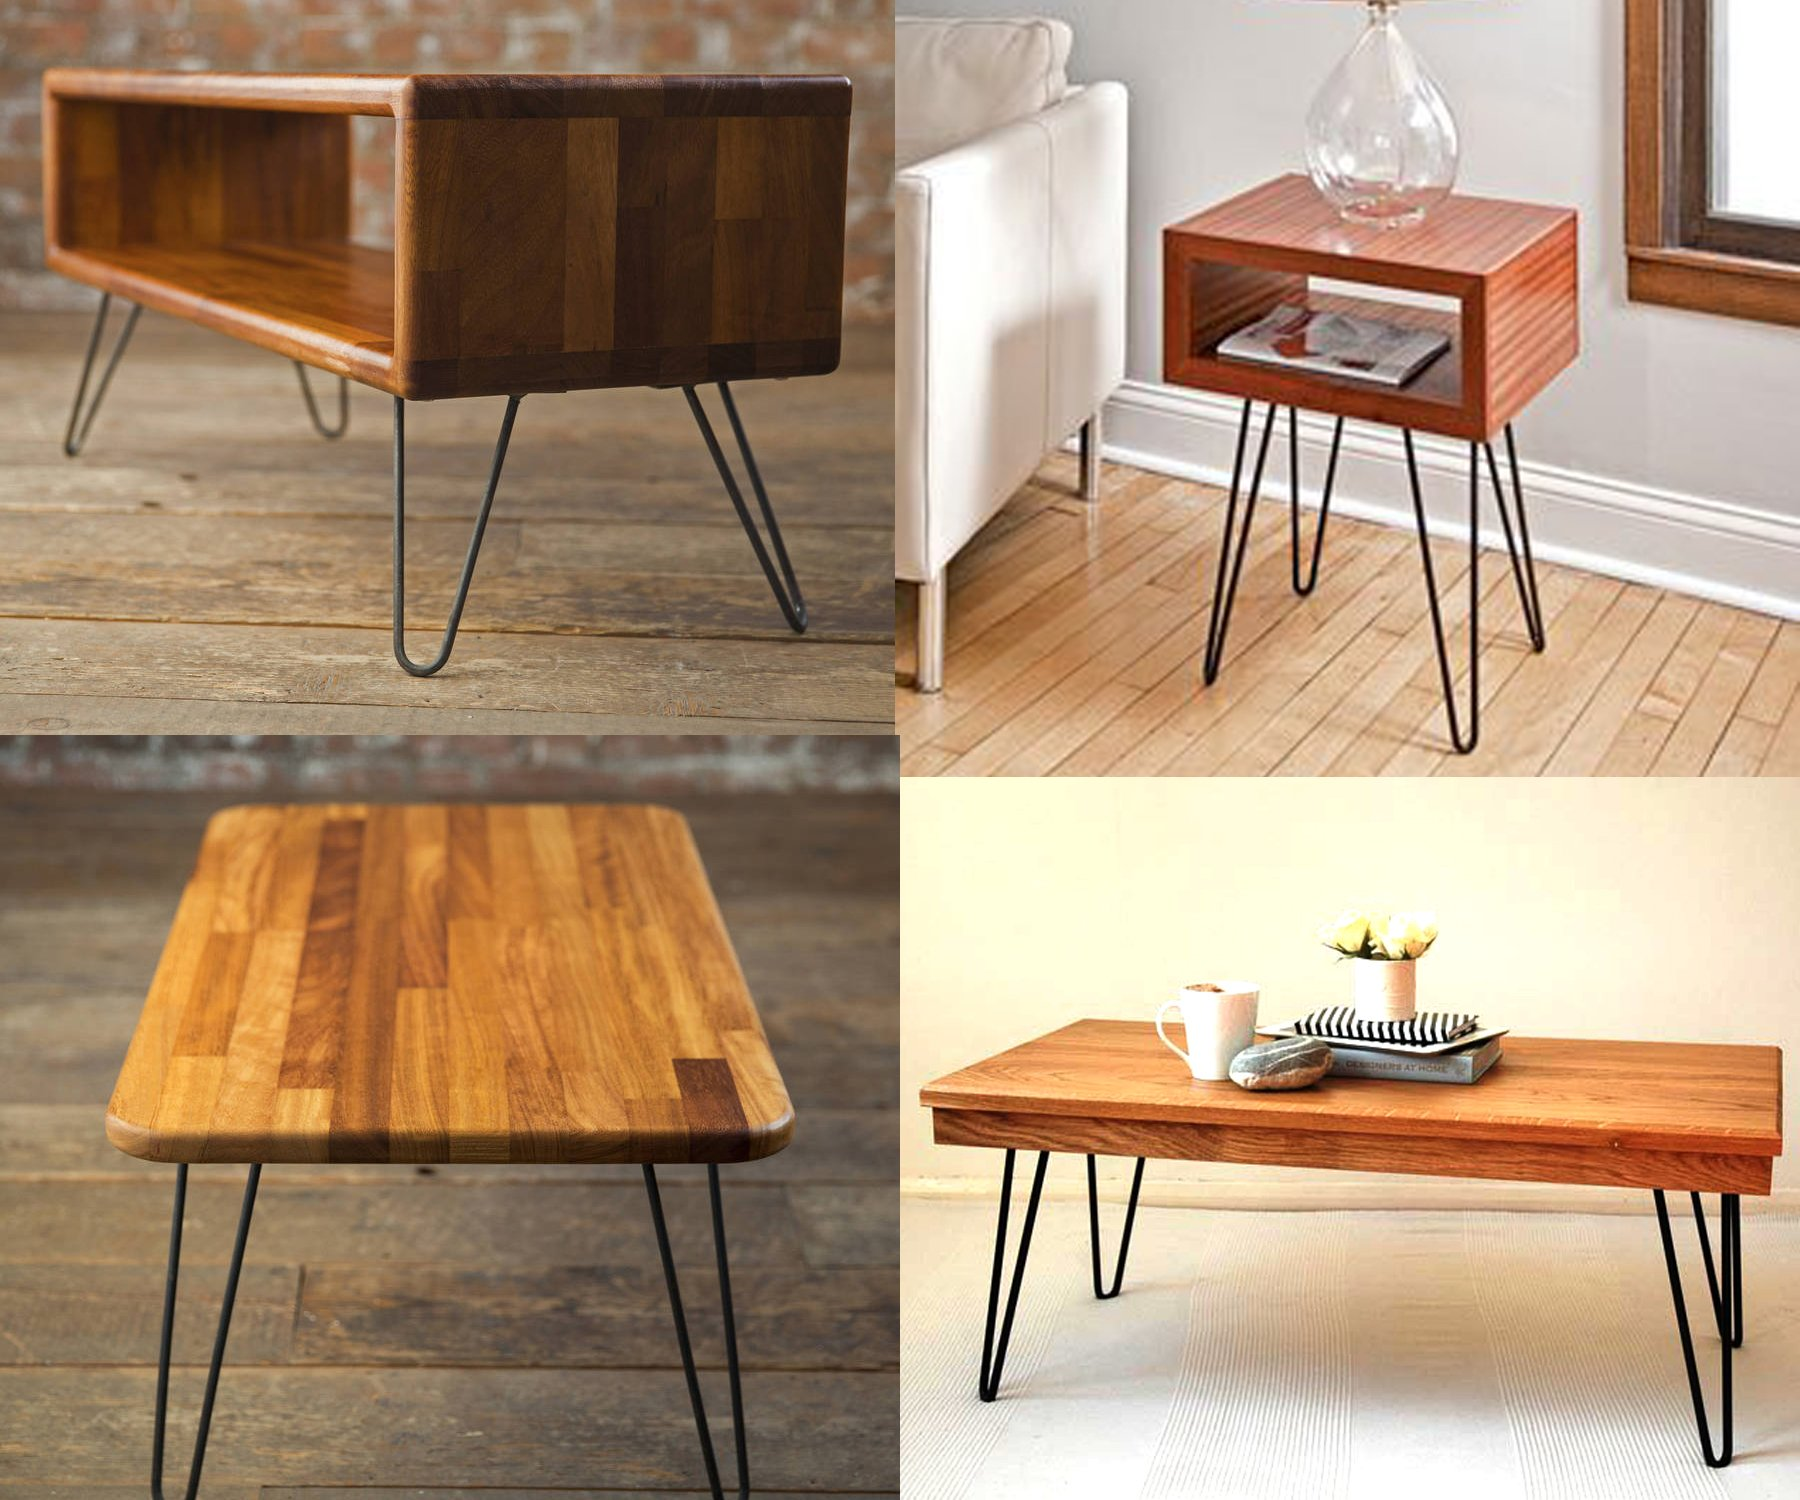 34'' Hairpin Legs (Matte Black) DIY Industrial Strength Mid Century Modern Table Legs, Set of 4 (34'') by ECLV (Image #8)